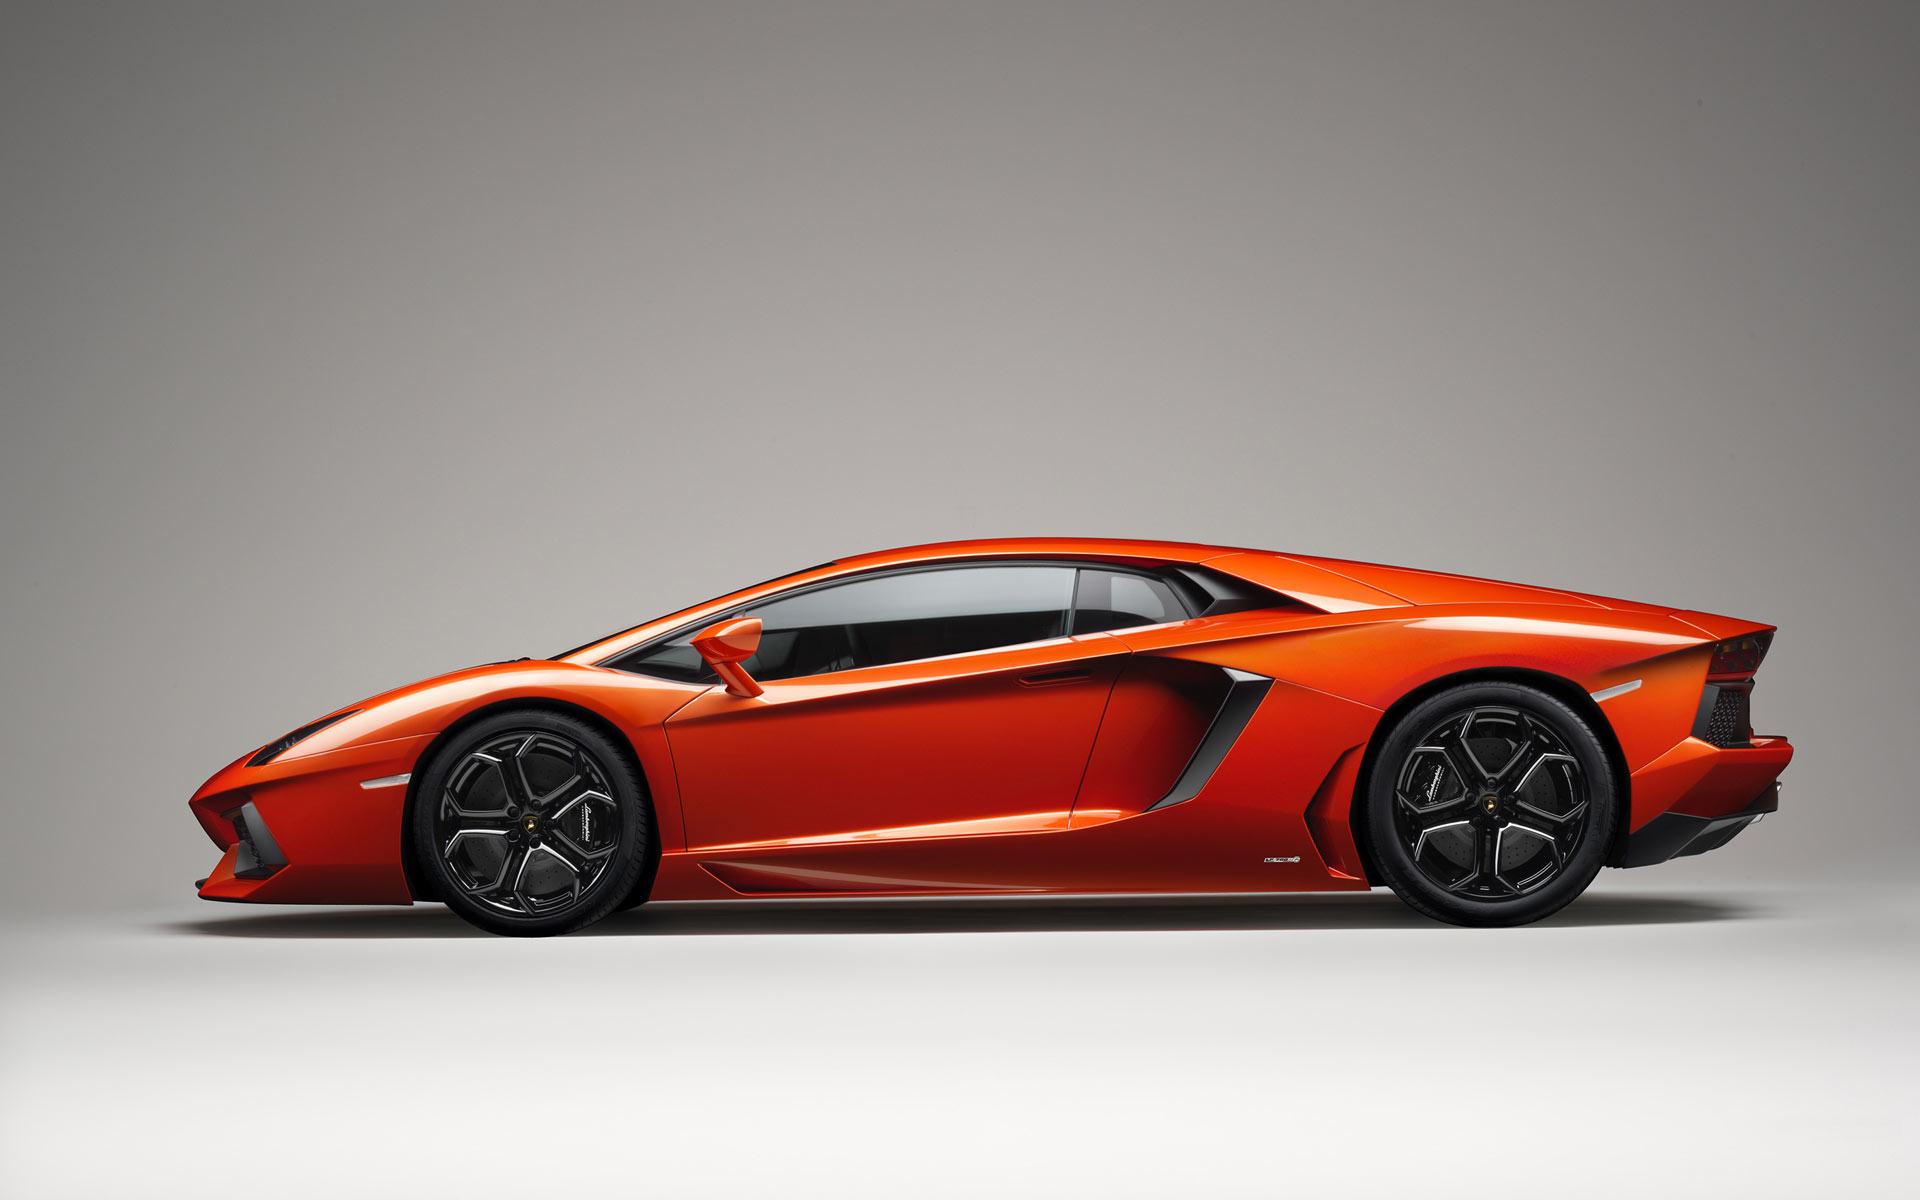 Car-wallpapers-Lamborghini Aventador LP 700 4-wallpaper